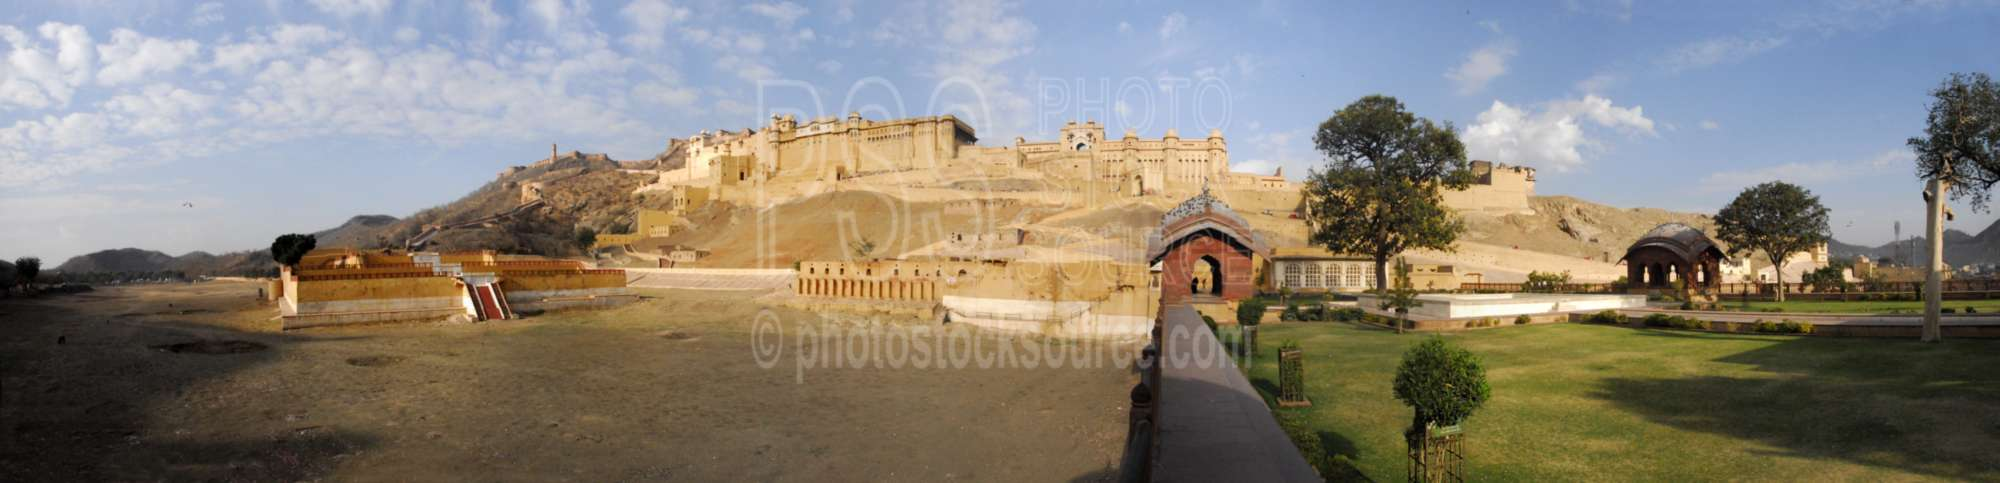 Amber Fort Sun Gate